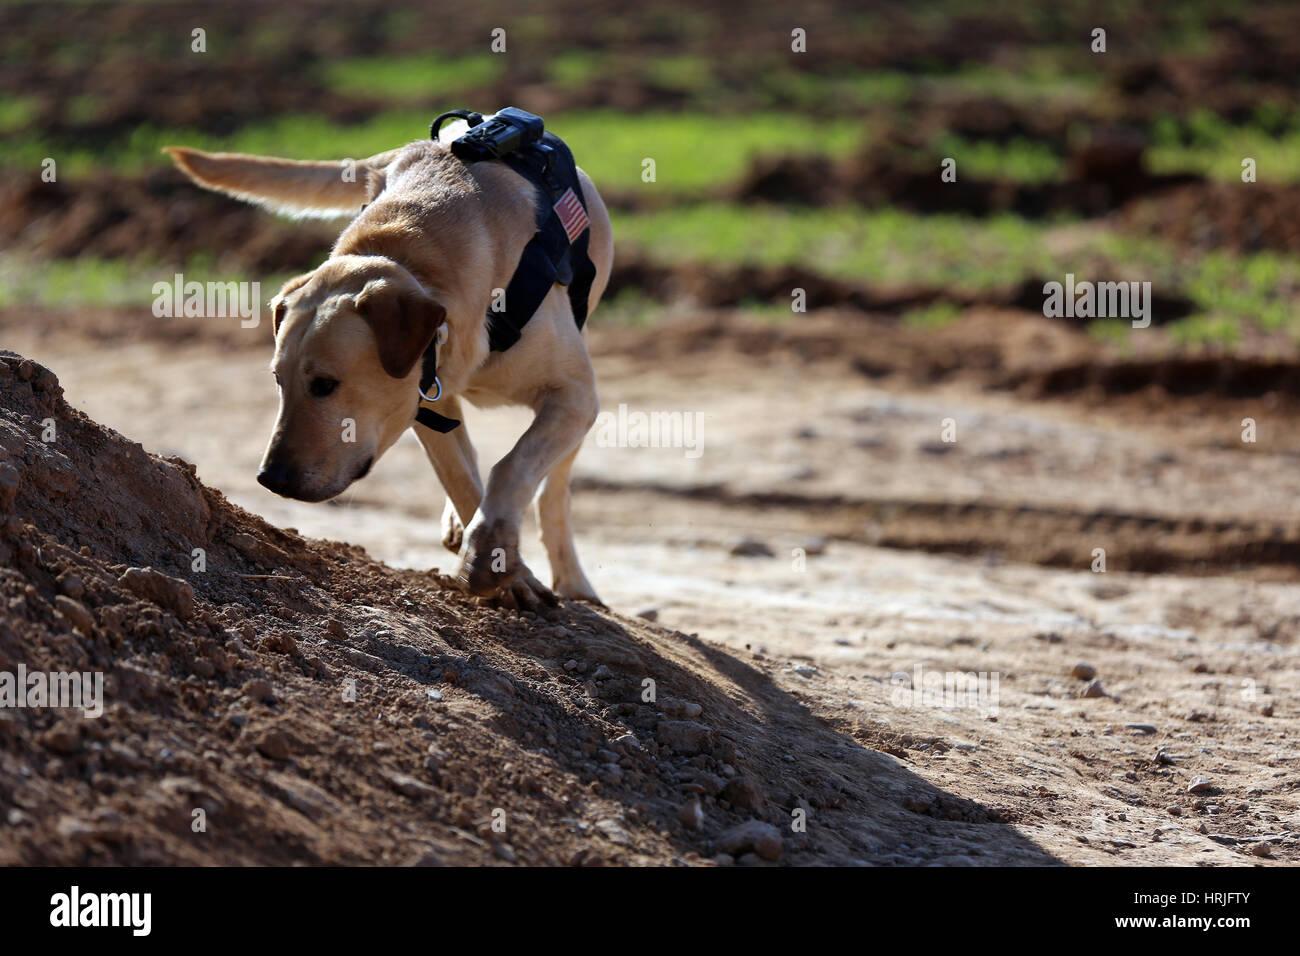 U.S. Marine Corps Dog - Stock Image